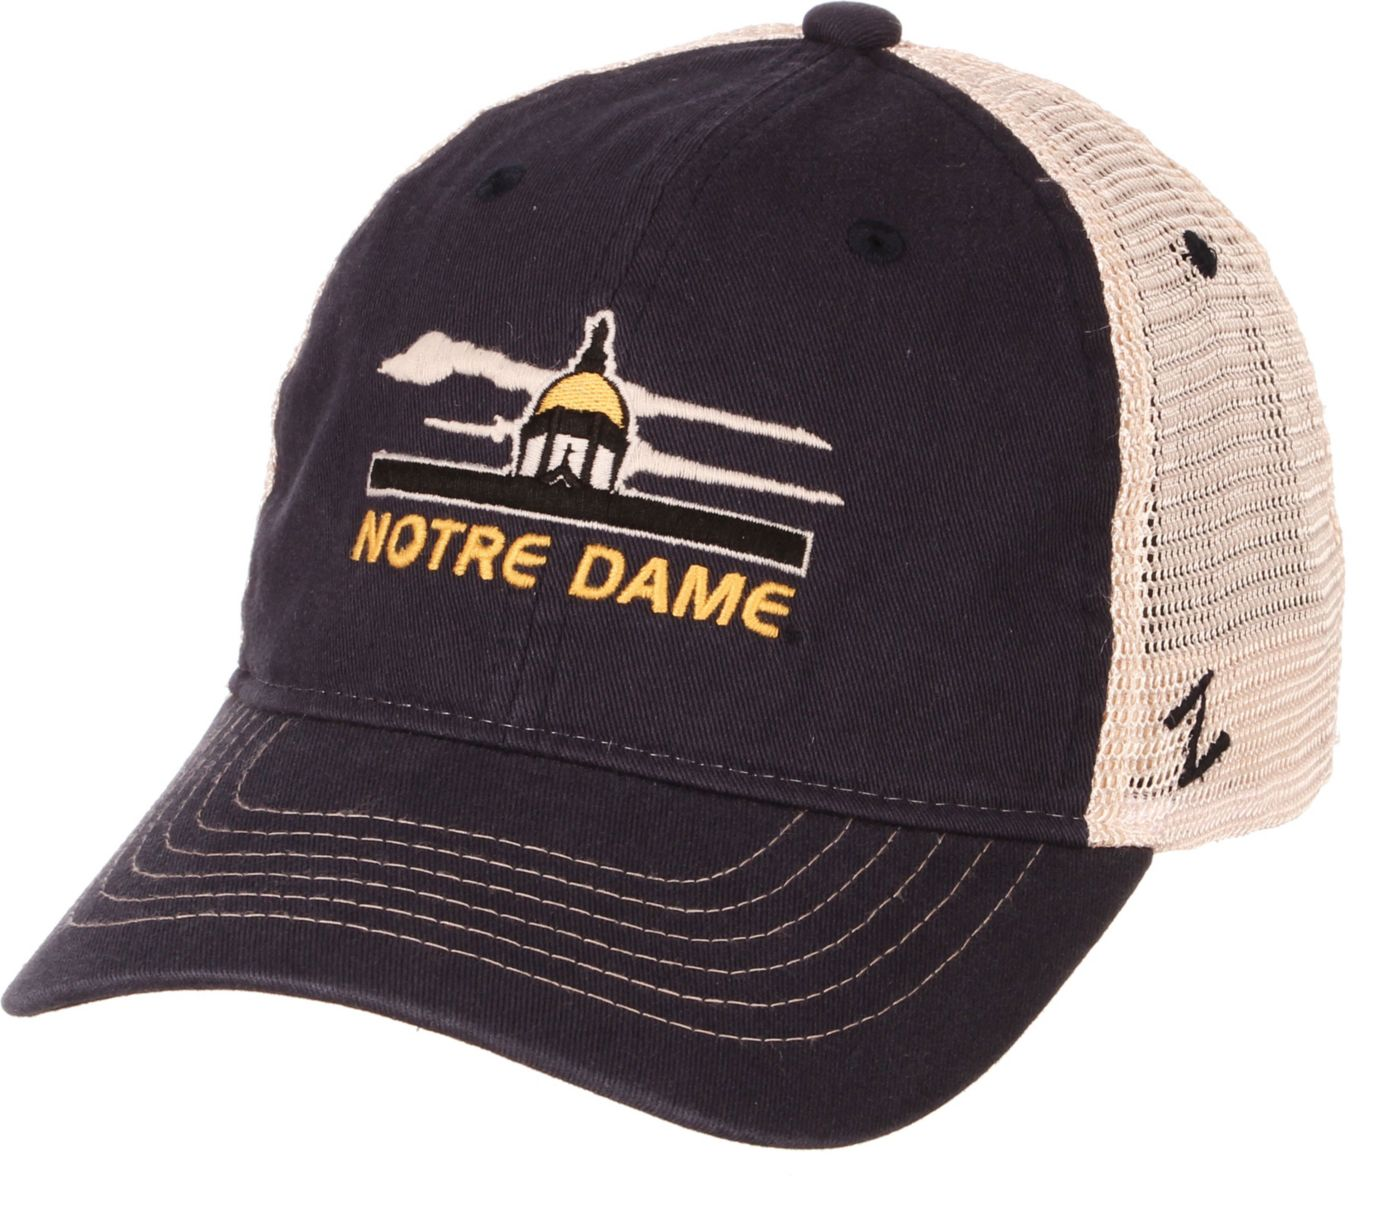 Zephyr Men's Notre Dame Fighting Irish Navy/White Adjustable Trucker Hat